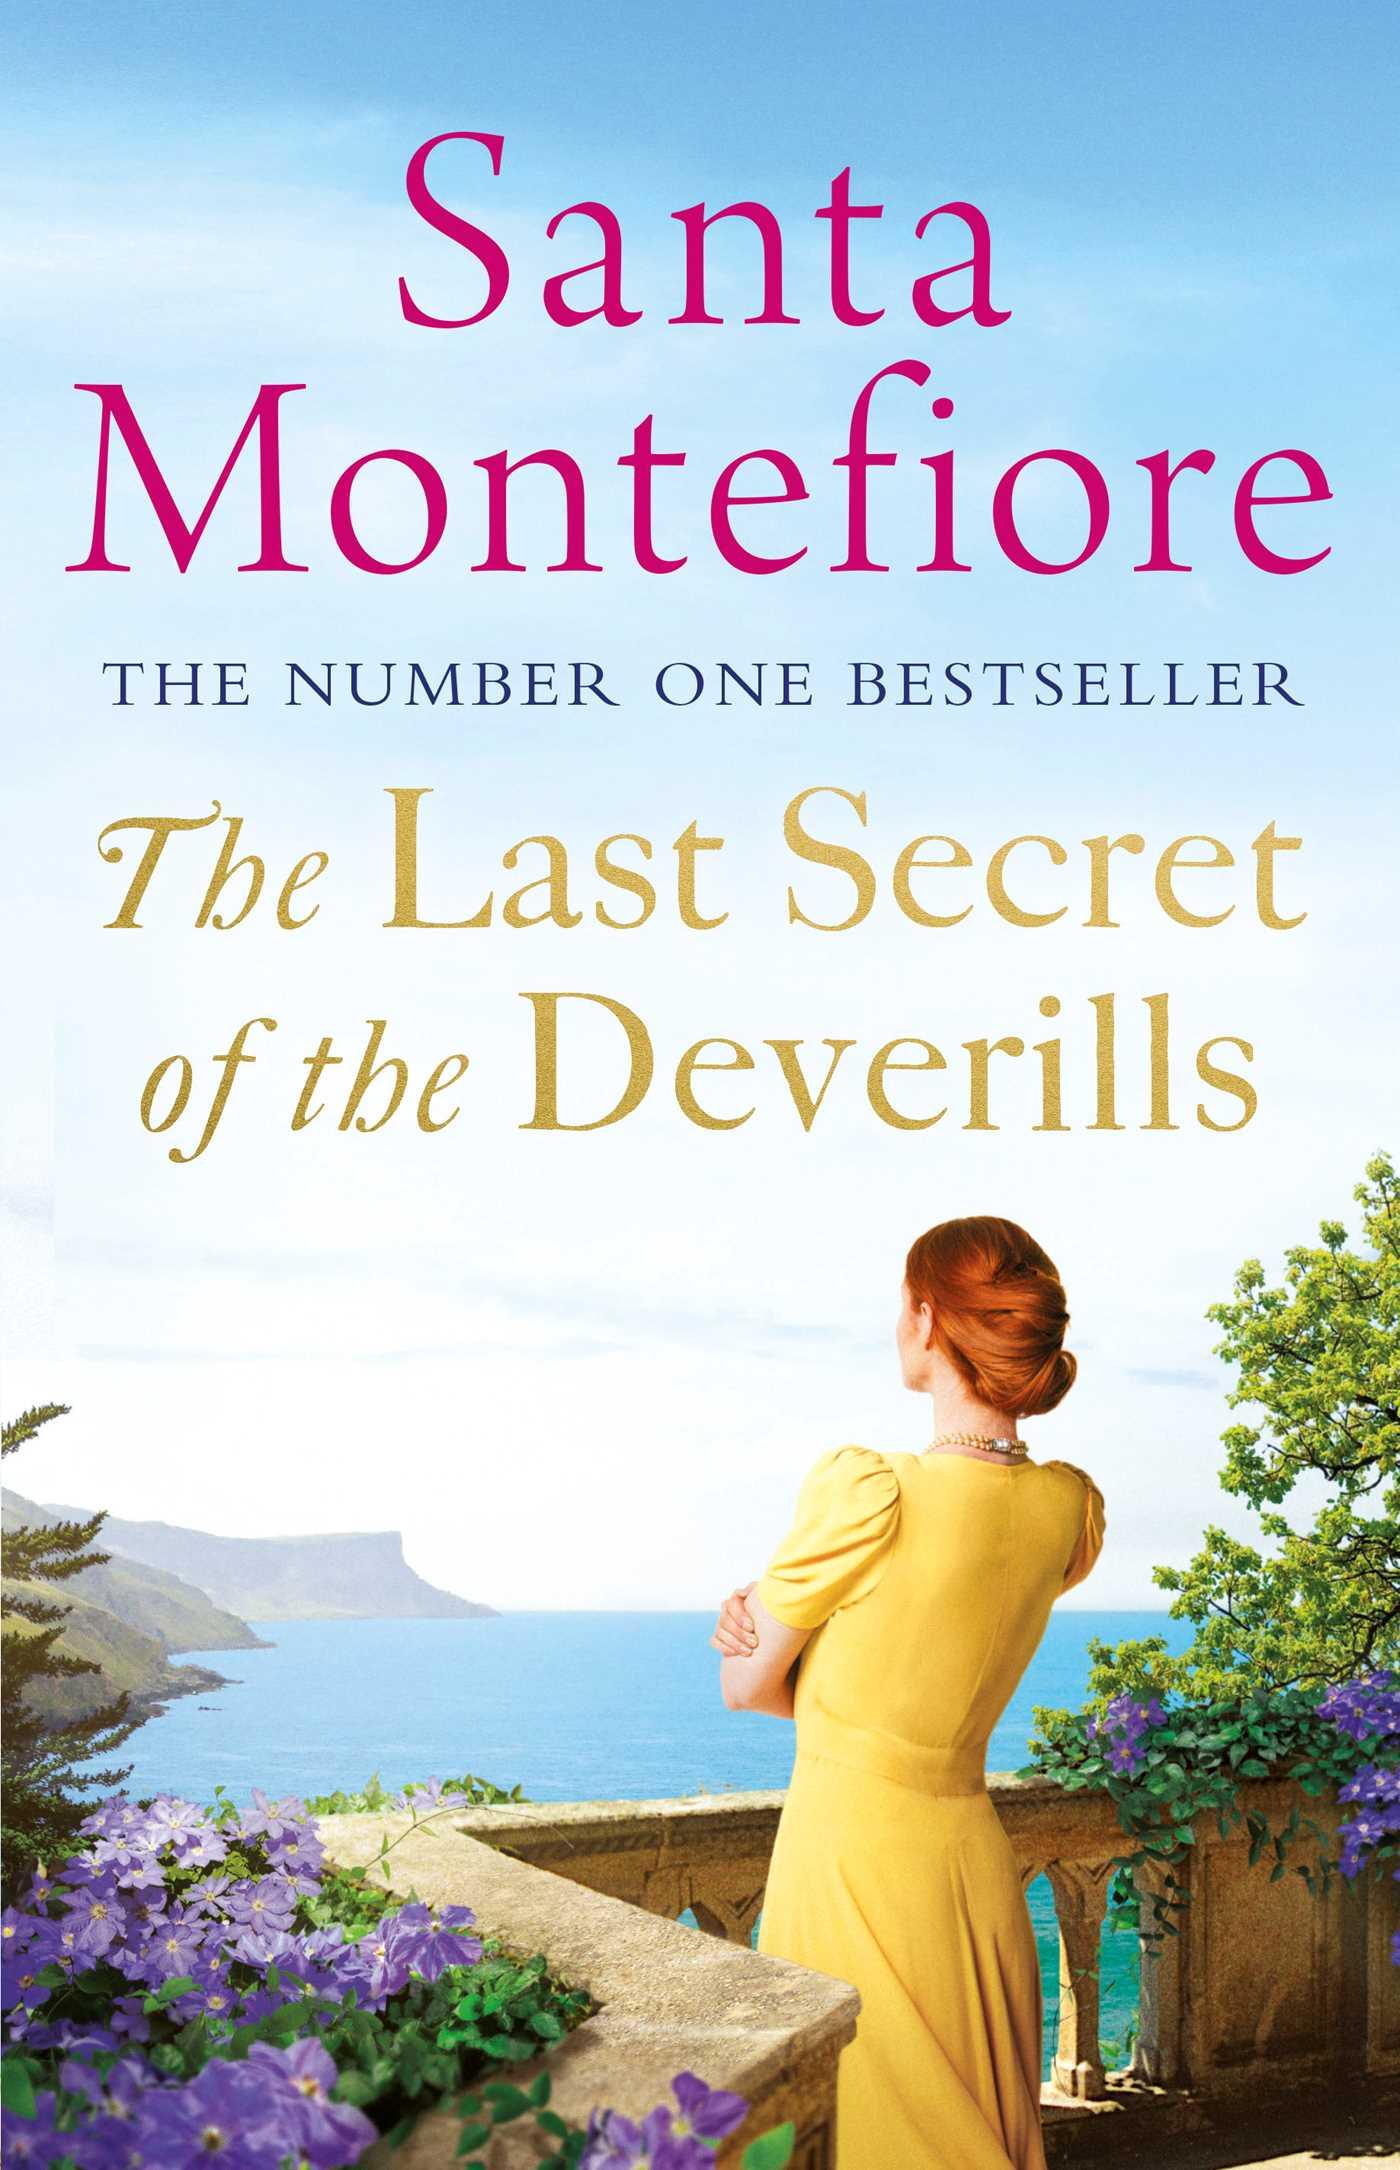 The last secret of the deverills 9781471135927 hr